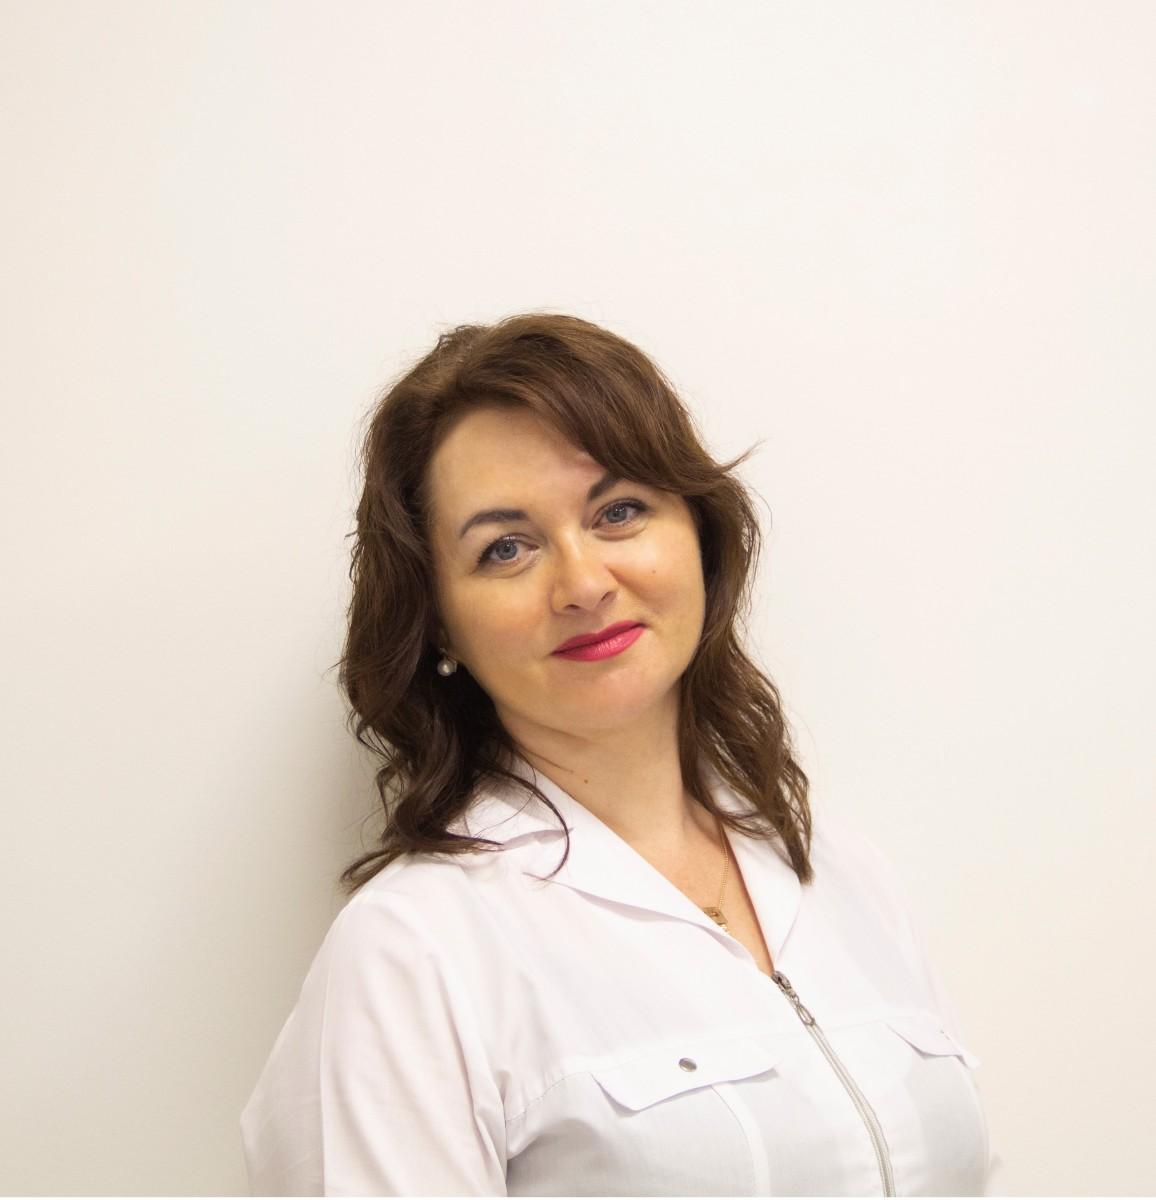 Ваврусевич Наталия Висвальдовна